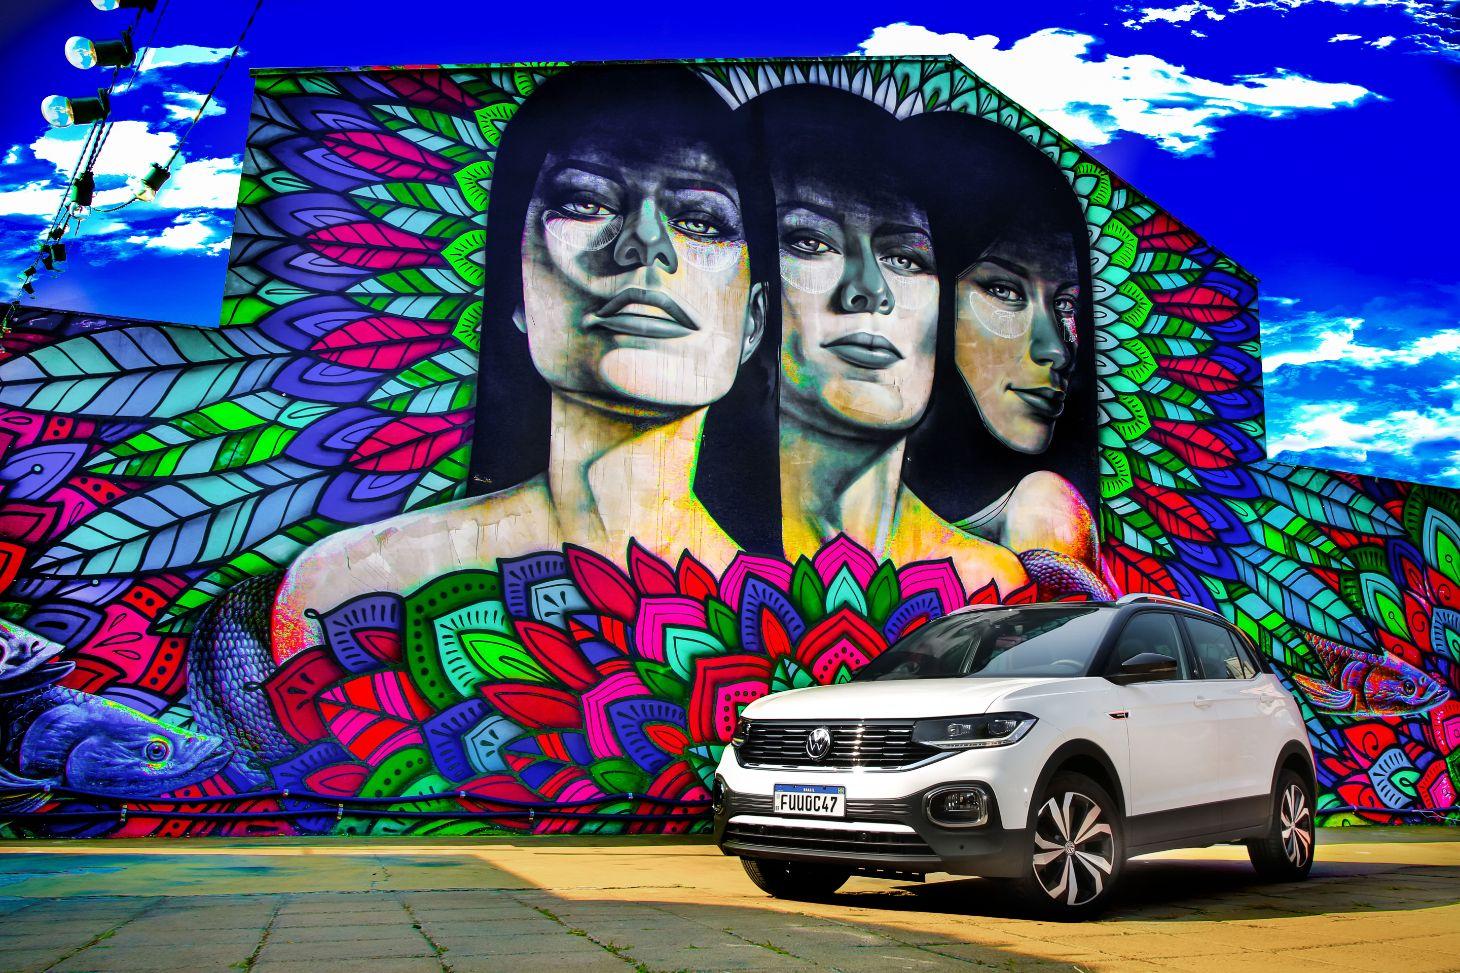 volkswagen t cross 2021 branco estacionado em frente a muro grafitado